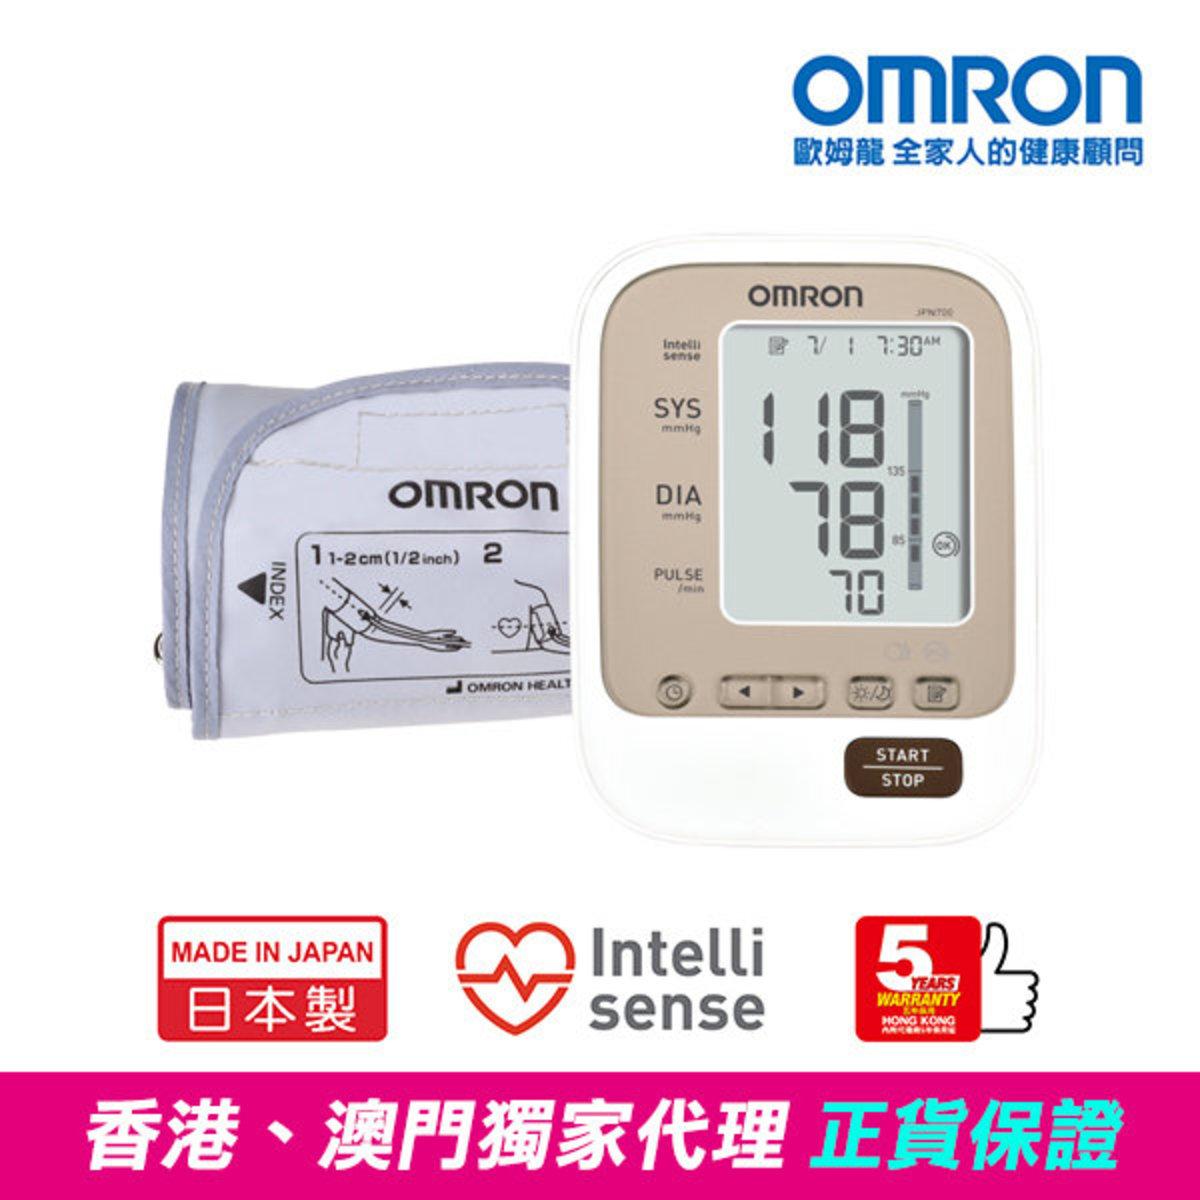 OMRON - JPN700 Arm Type Blood Pressure Monitor